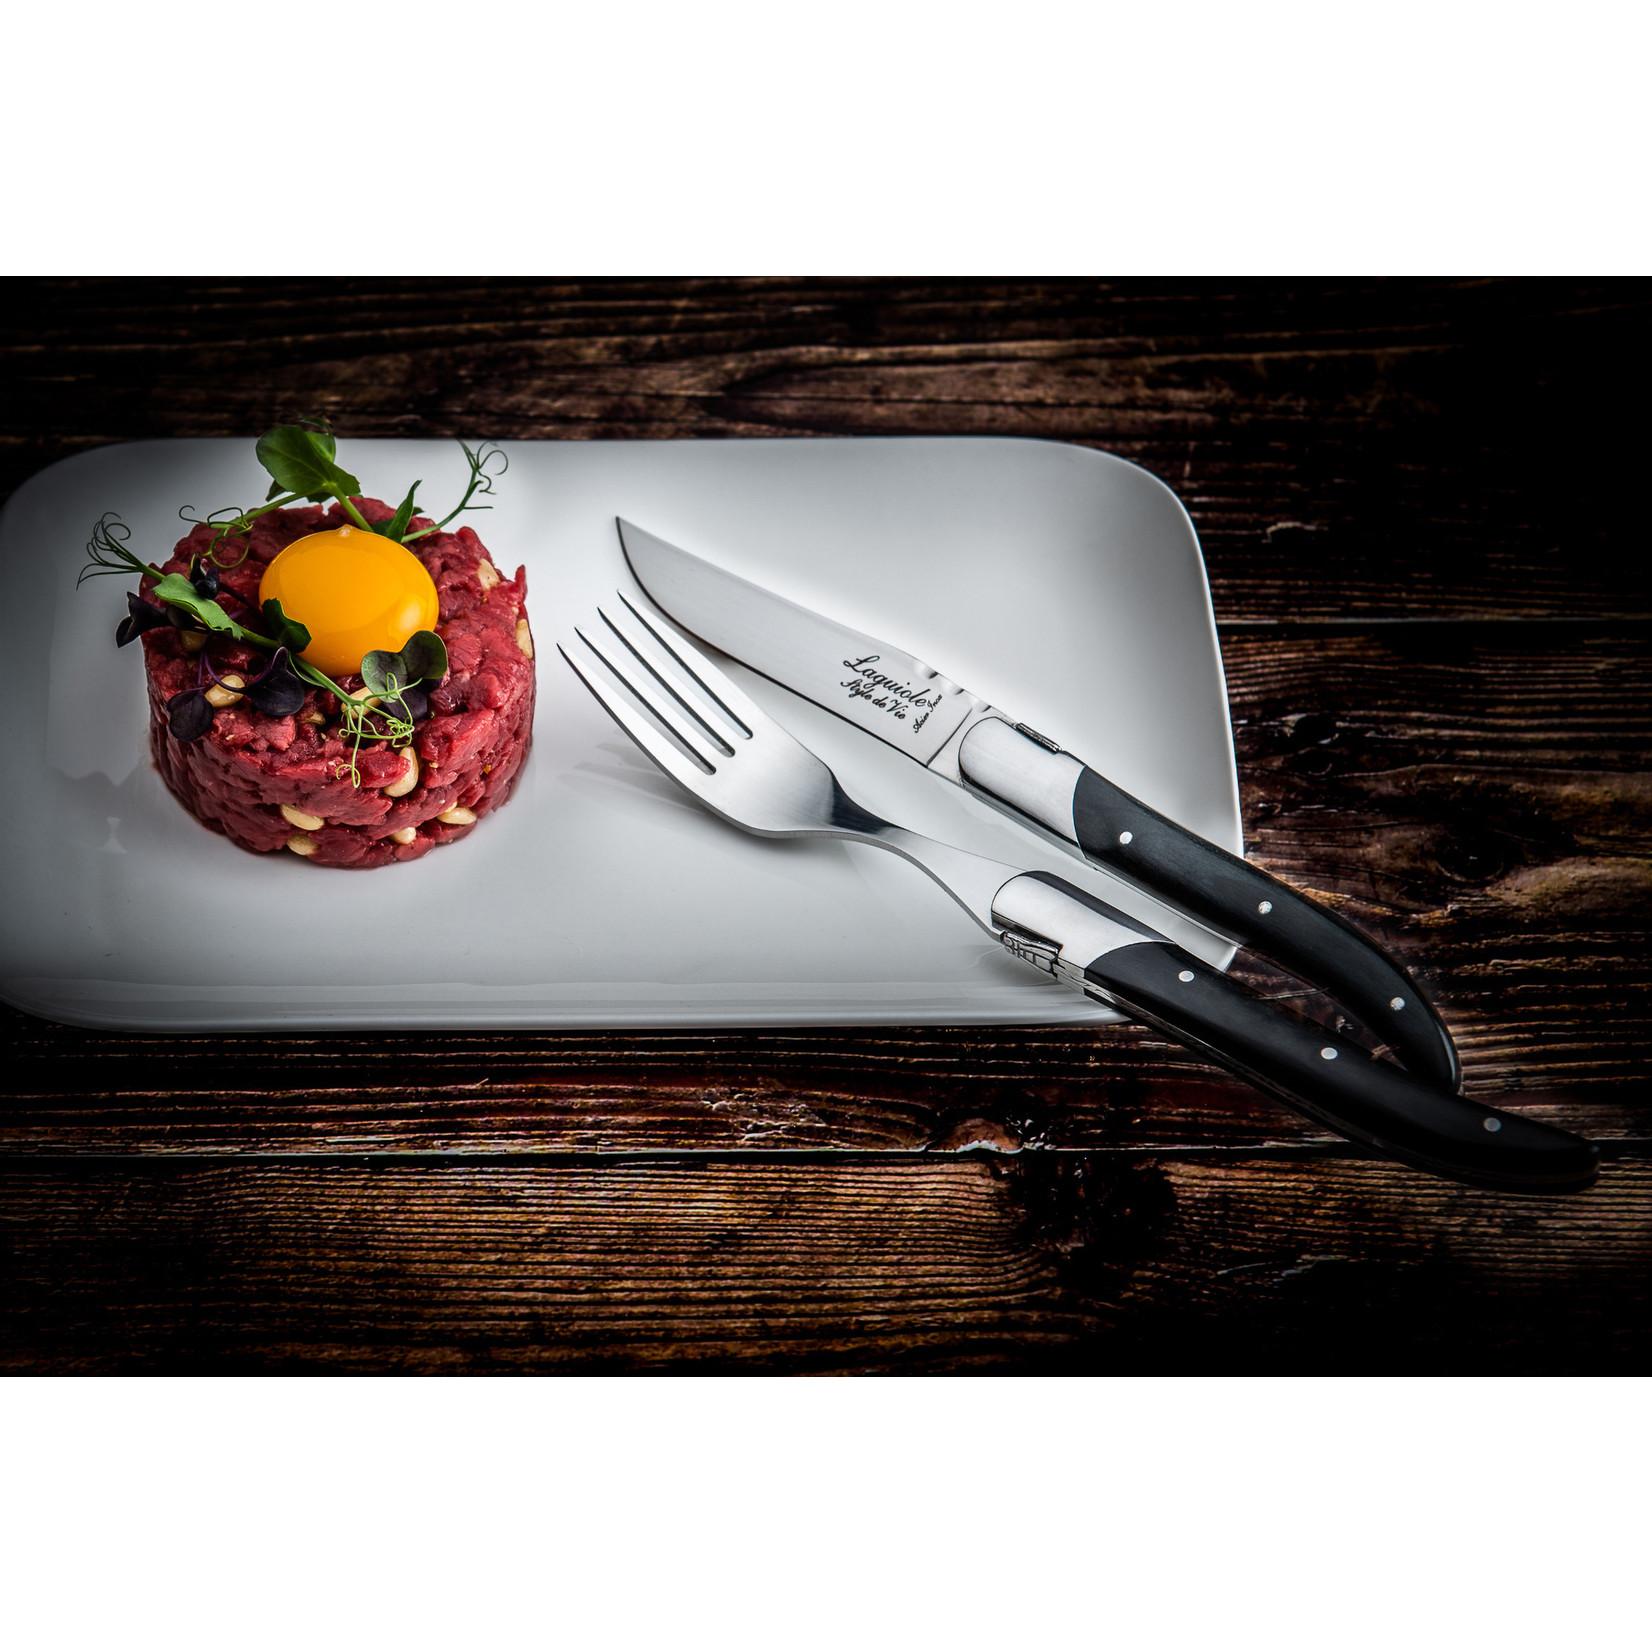 Laguiole Style de Vie Laguiole Style de Vie Luxury Line vorken 6-delig ebbenhout